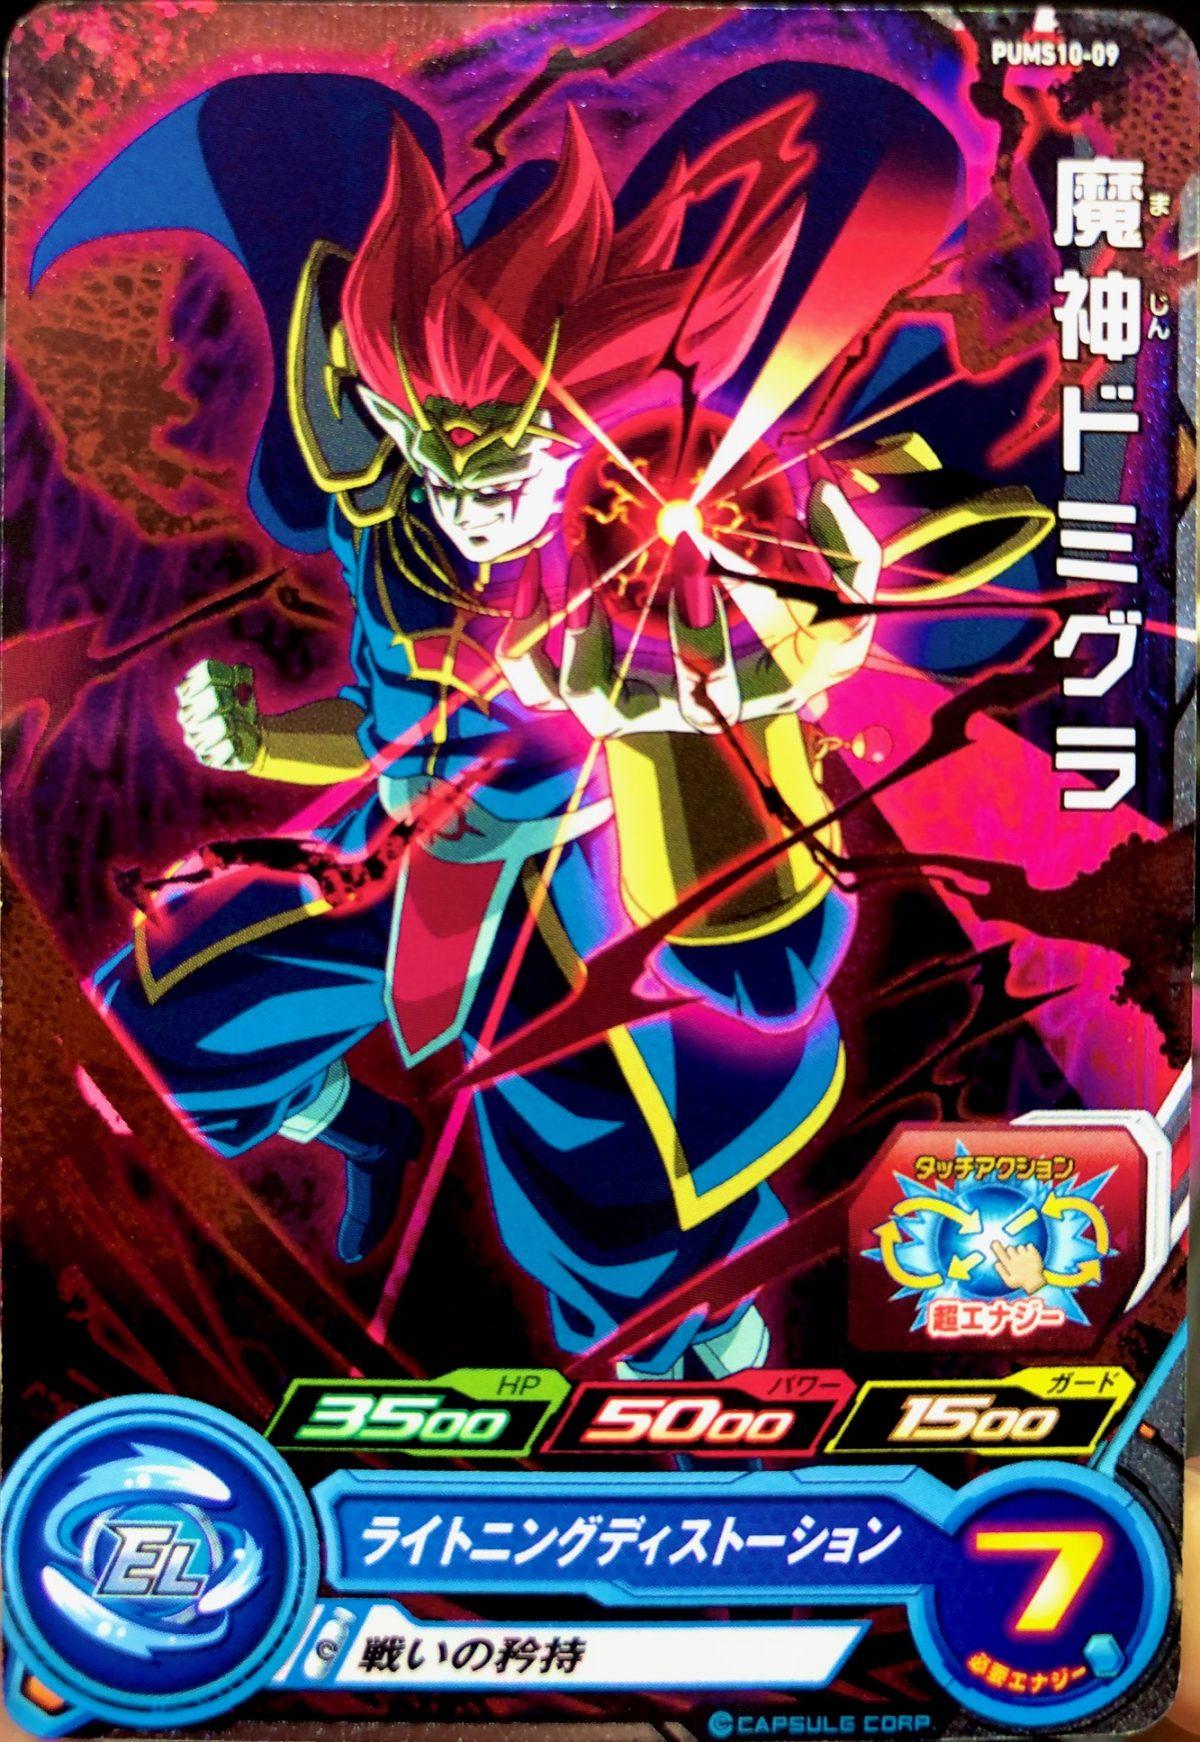 PUMS10-09 魔神ドミグラ